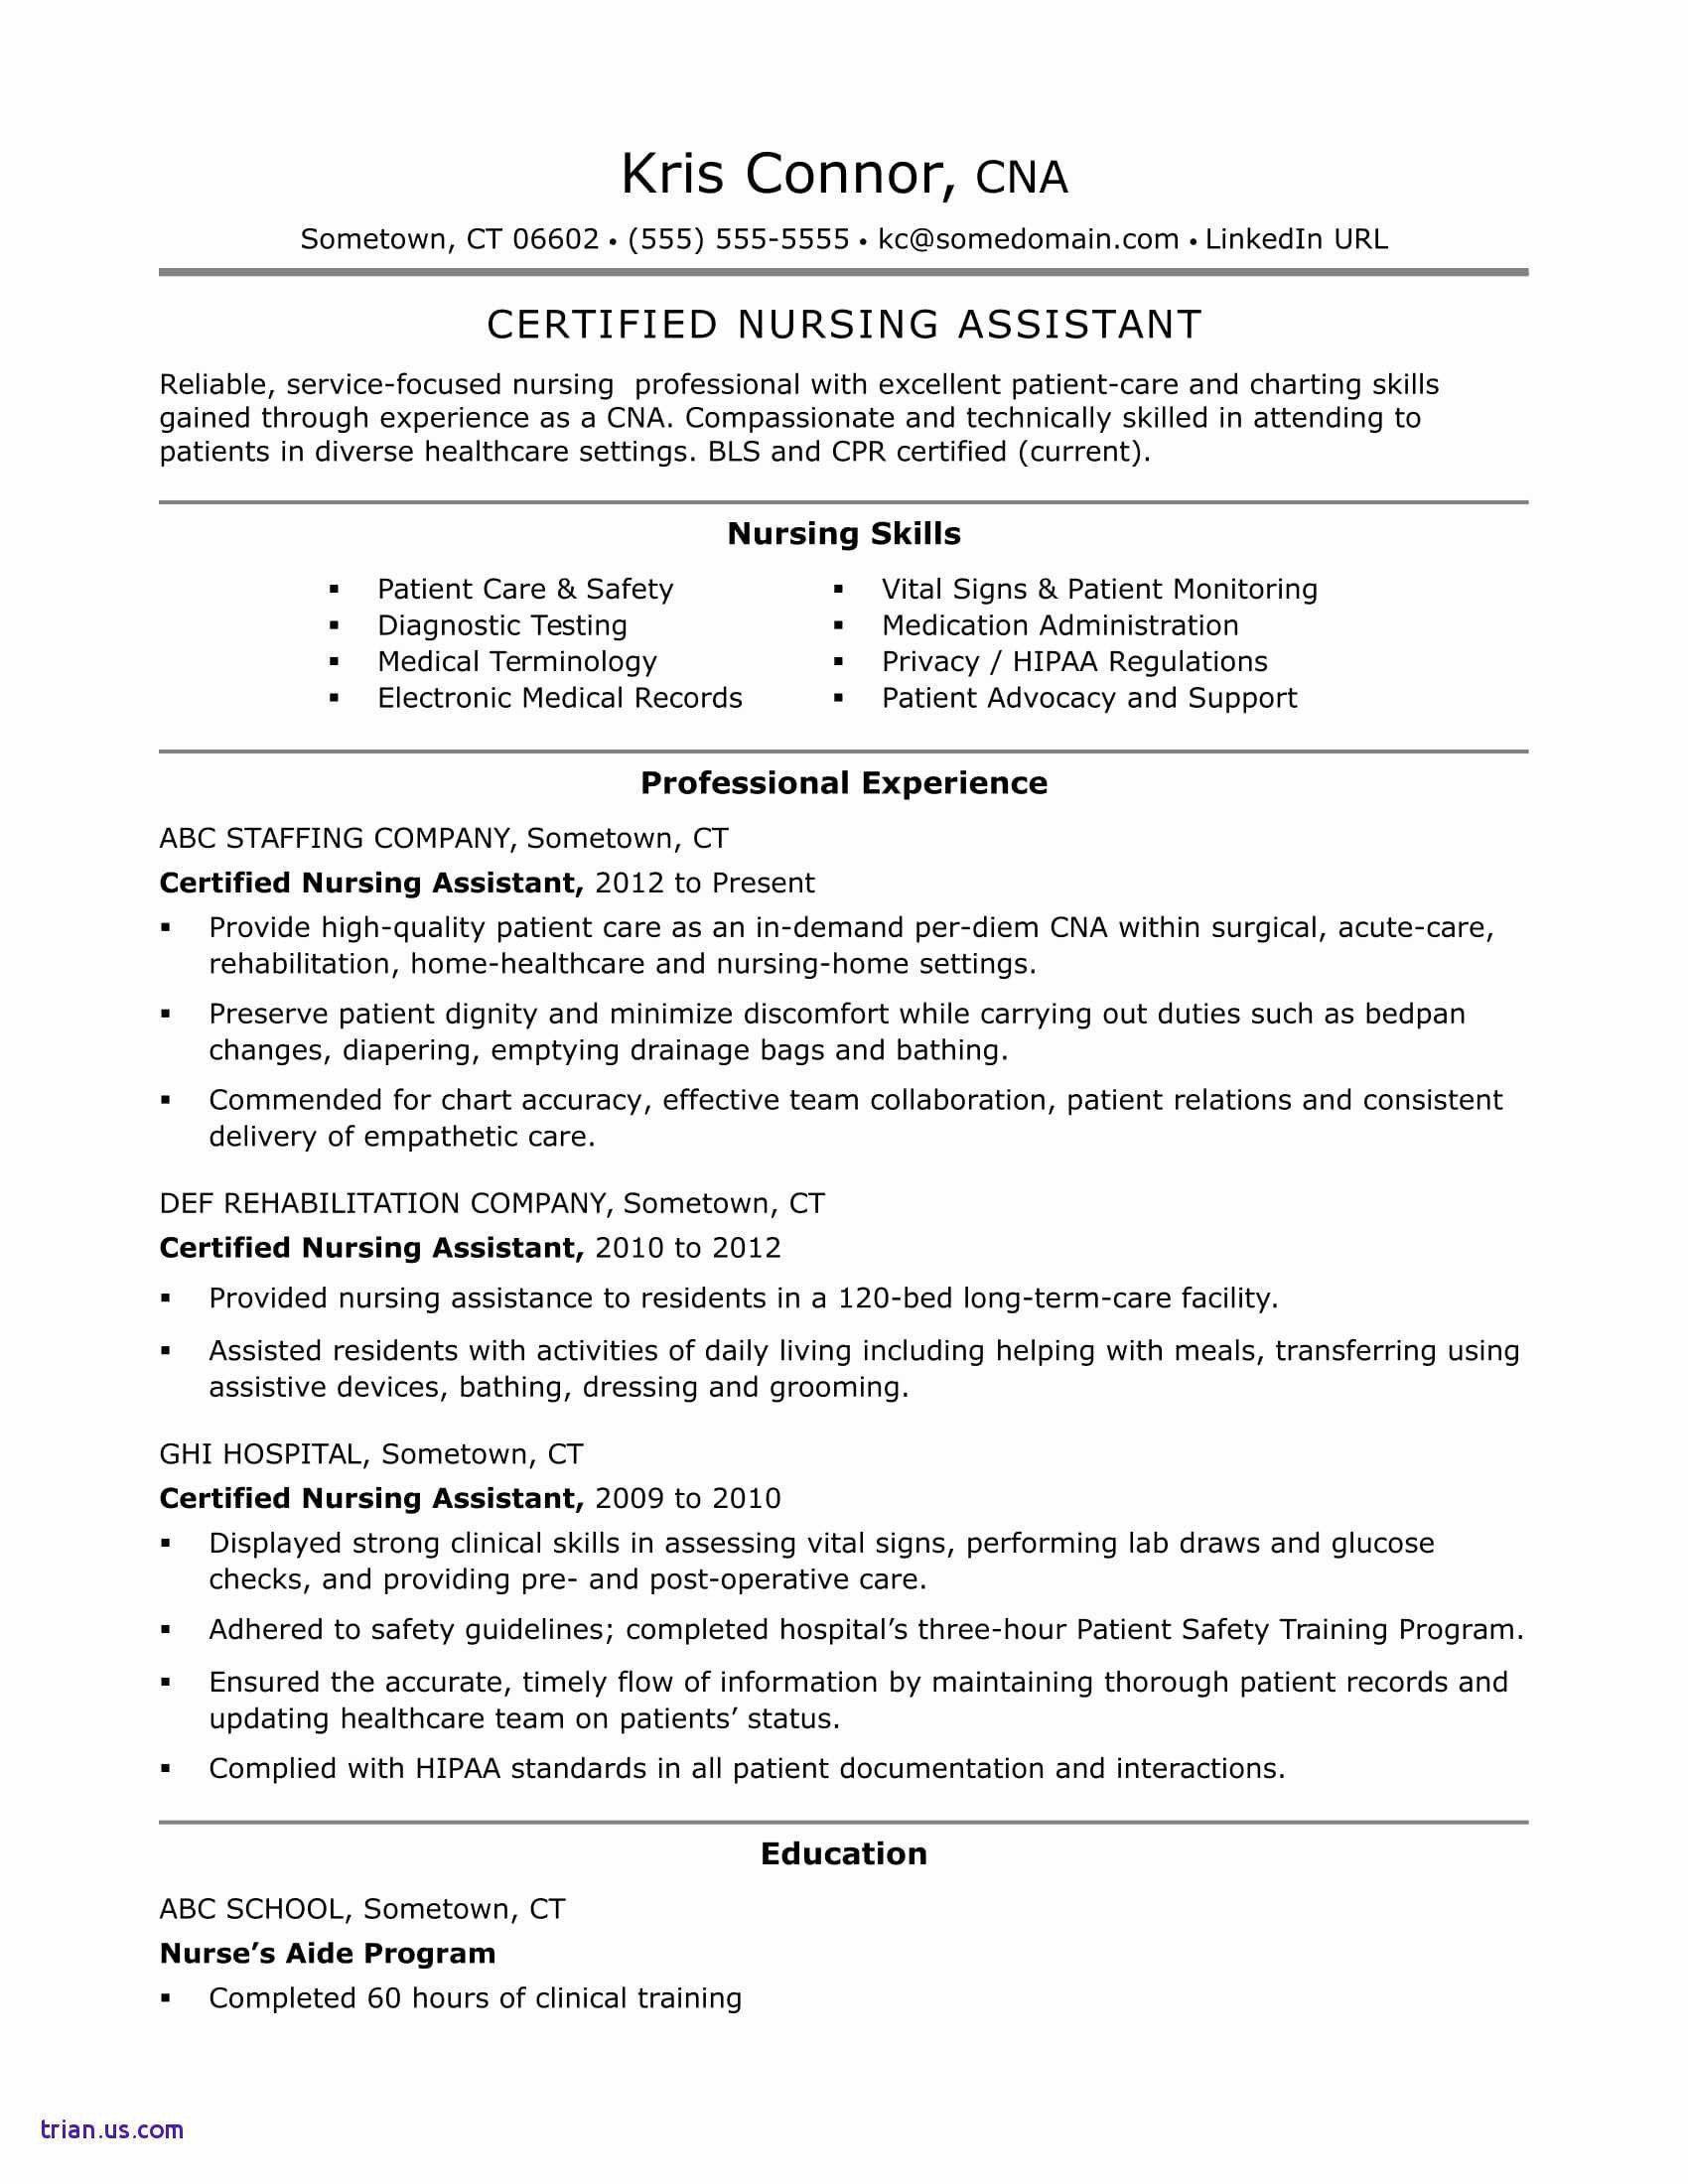 Premedical school resume lovely 8 nursing assistant